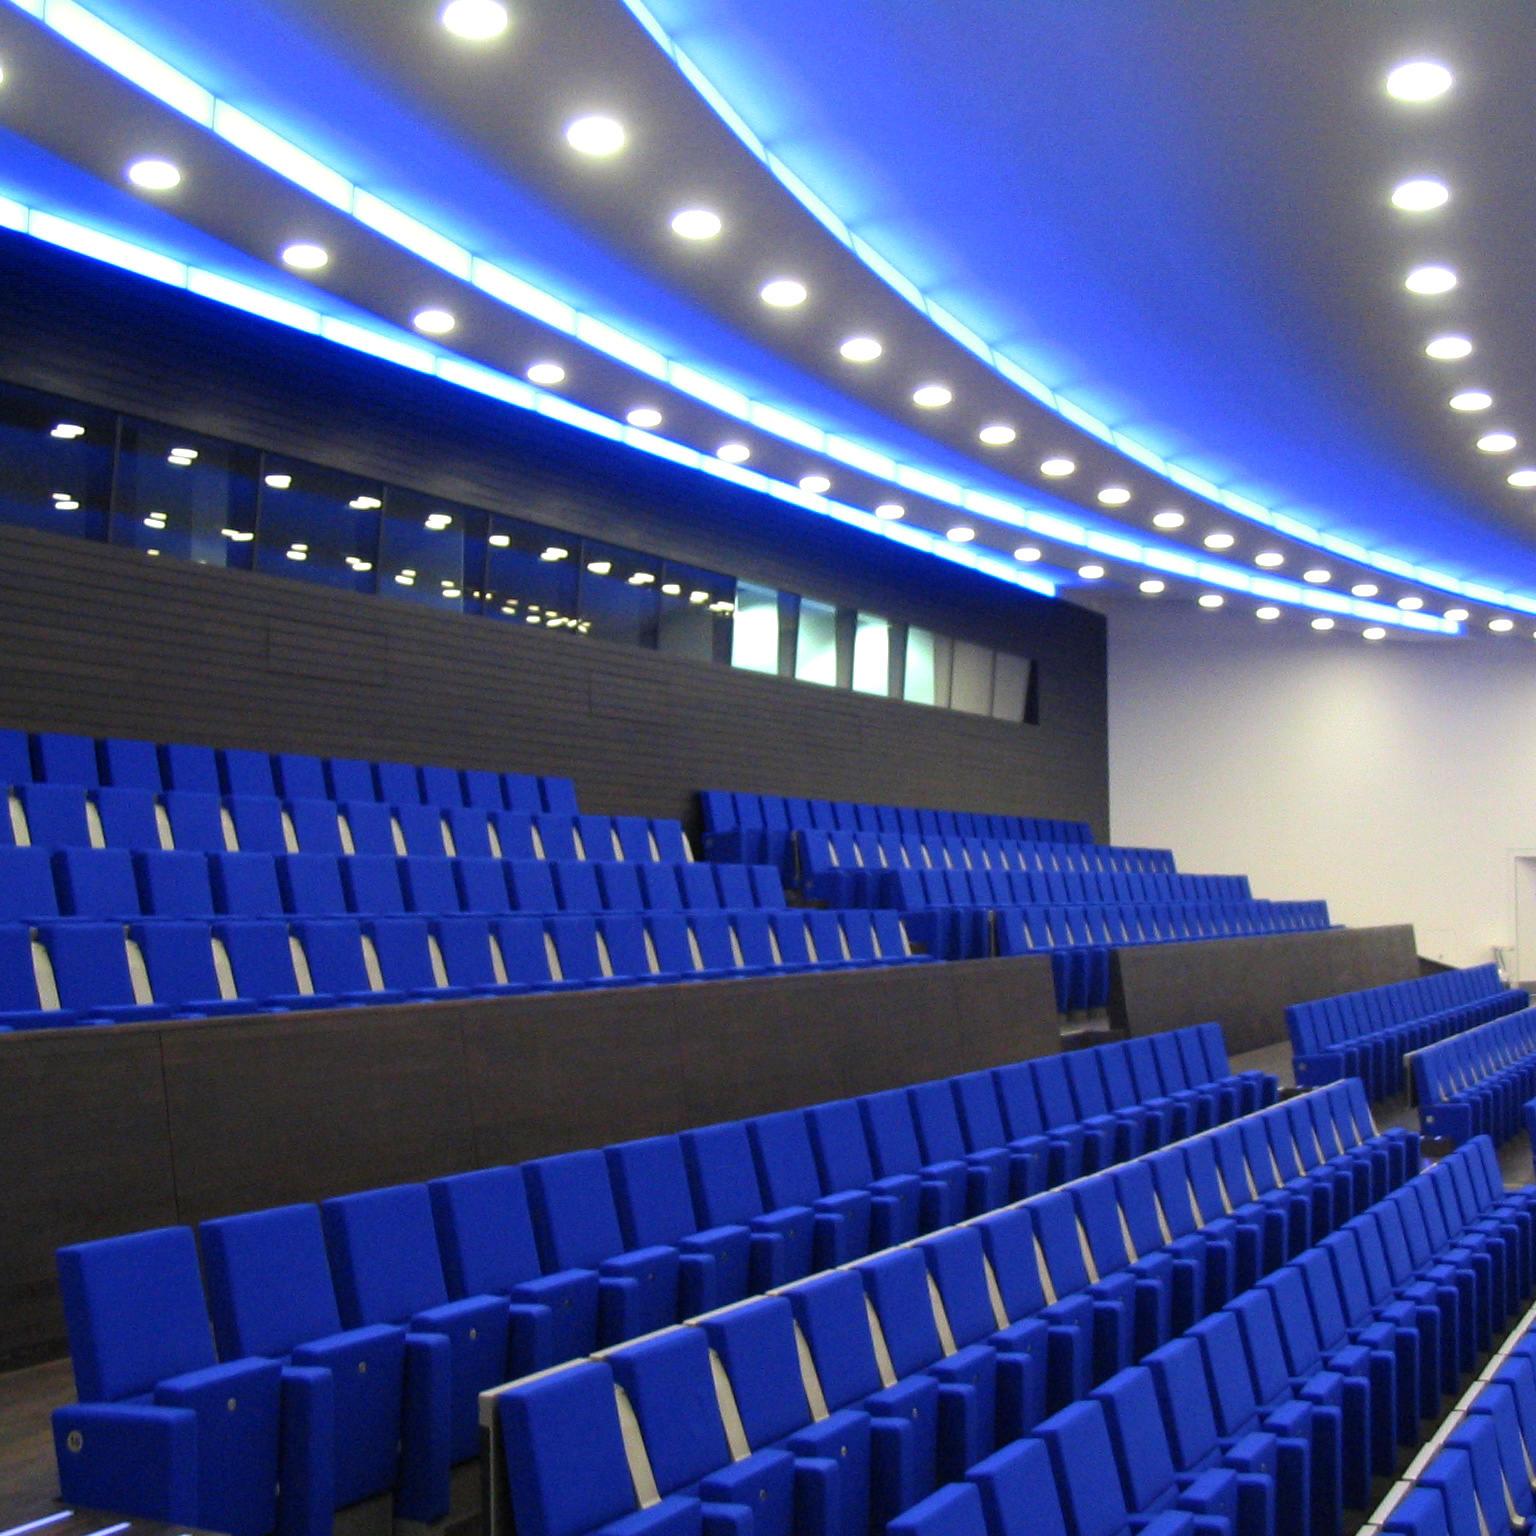 ccd congress center d sseldorf legno werkst tte f r. Black Bedroom Furniture Sets. Home Design Ideas